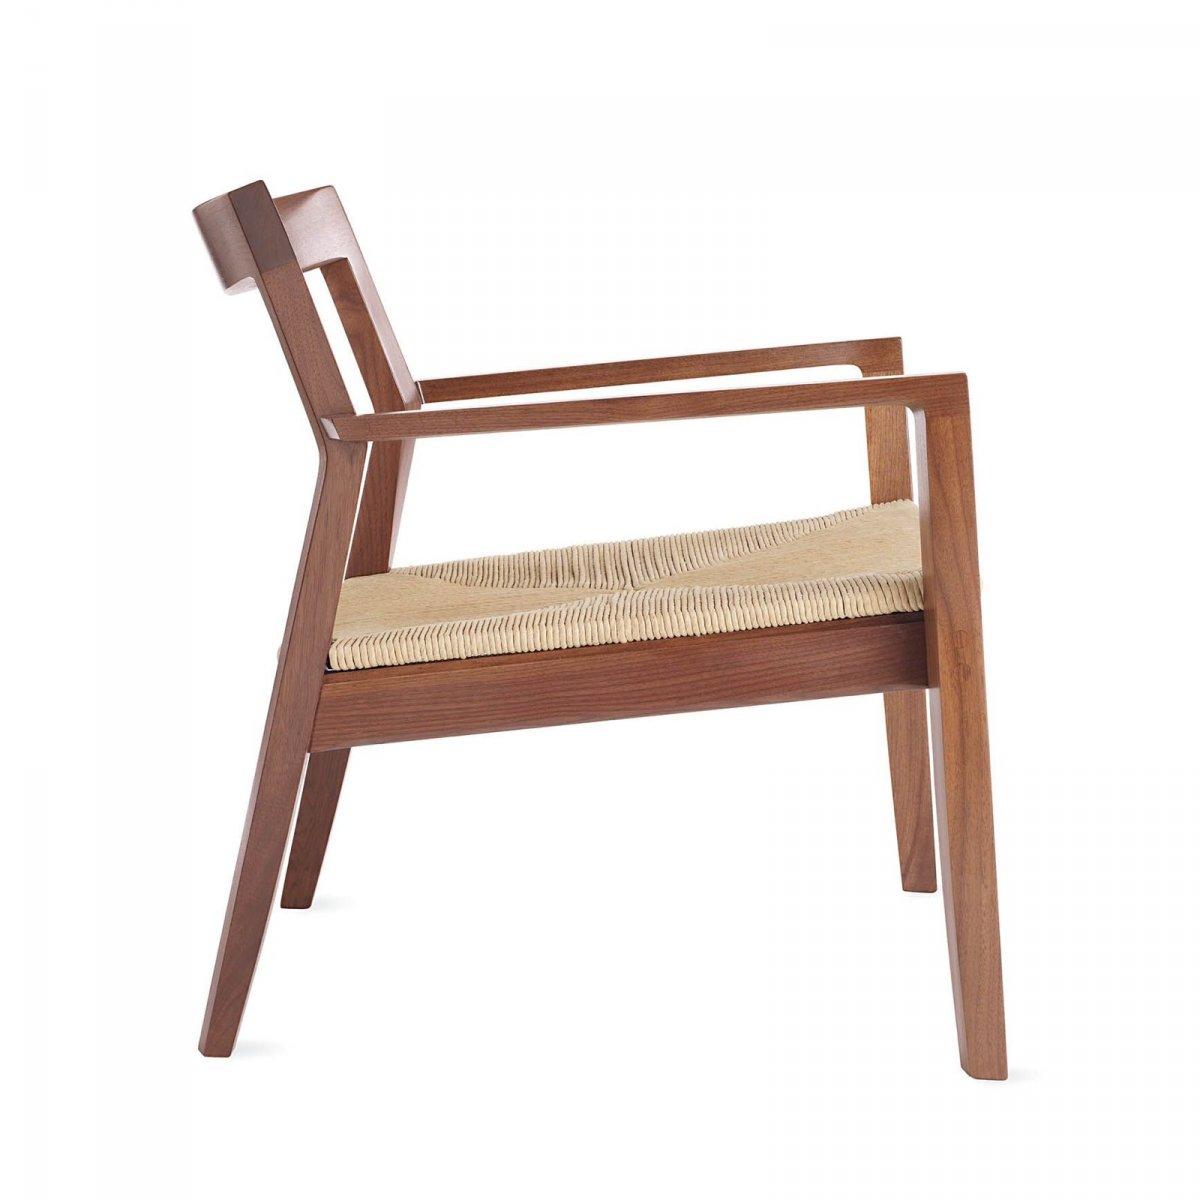 Krusin Lounge Arm Chair, walnut, side view.